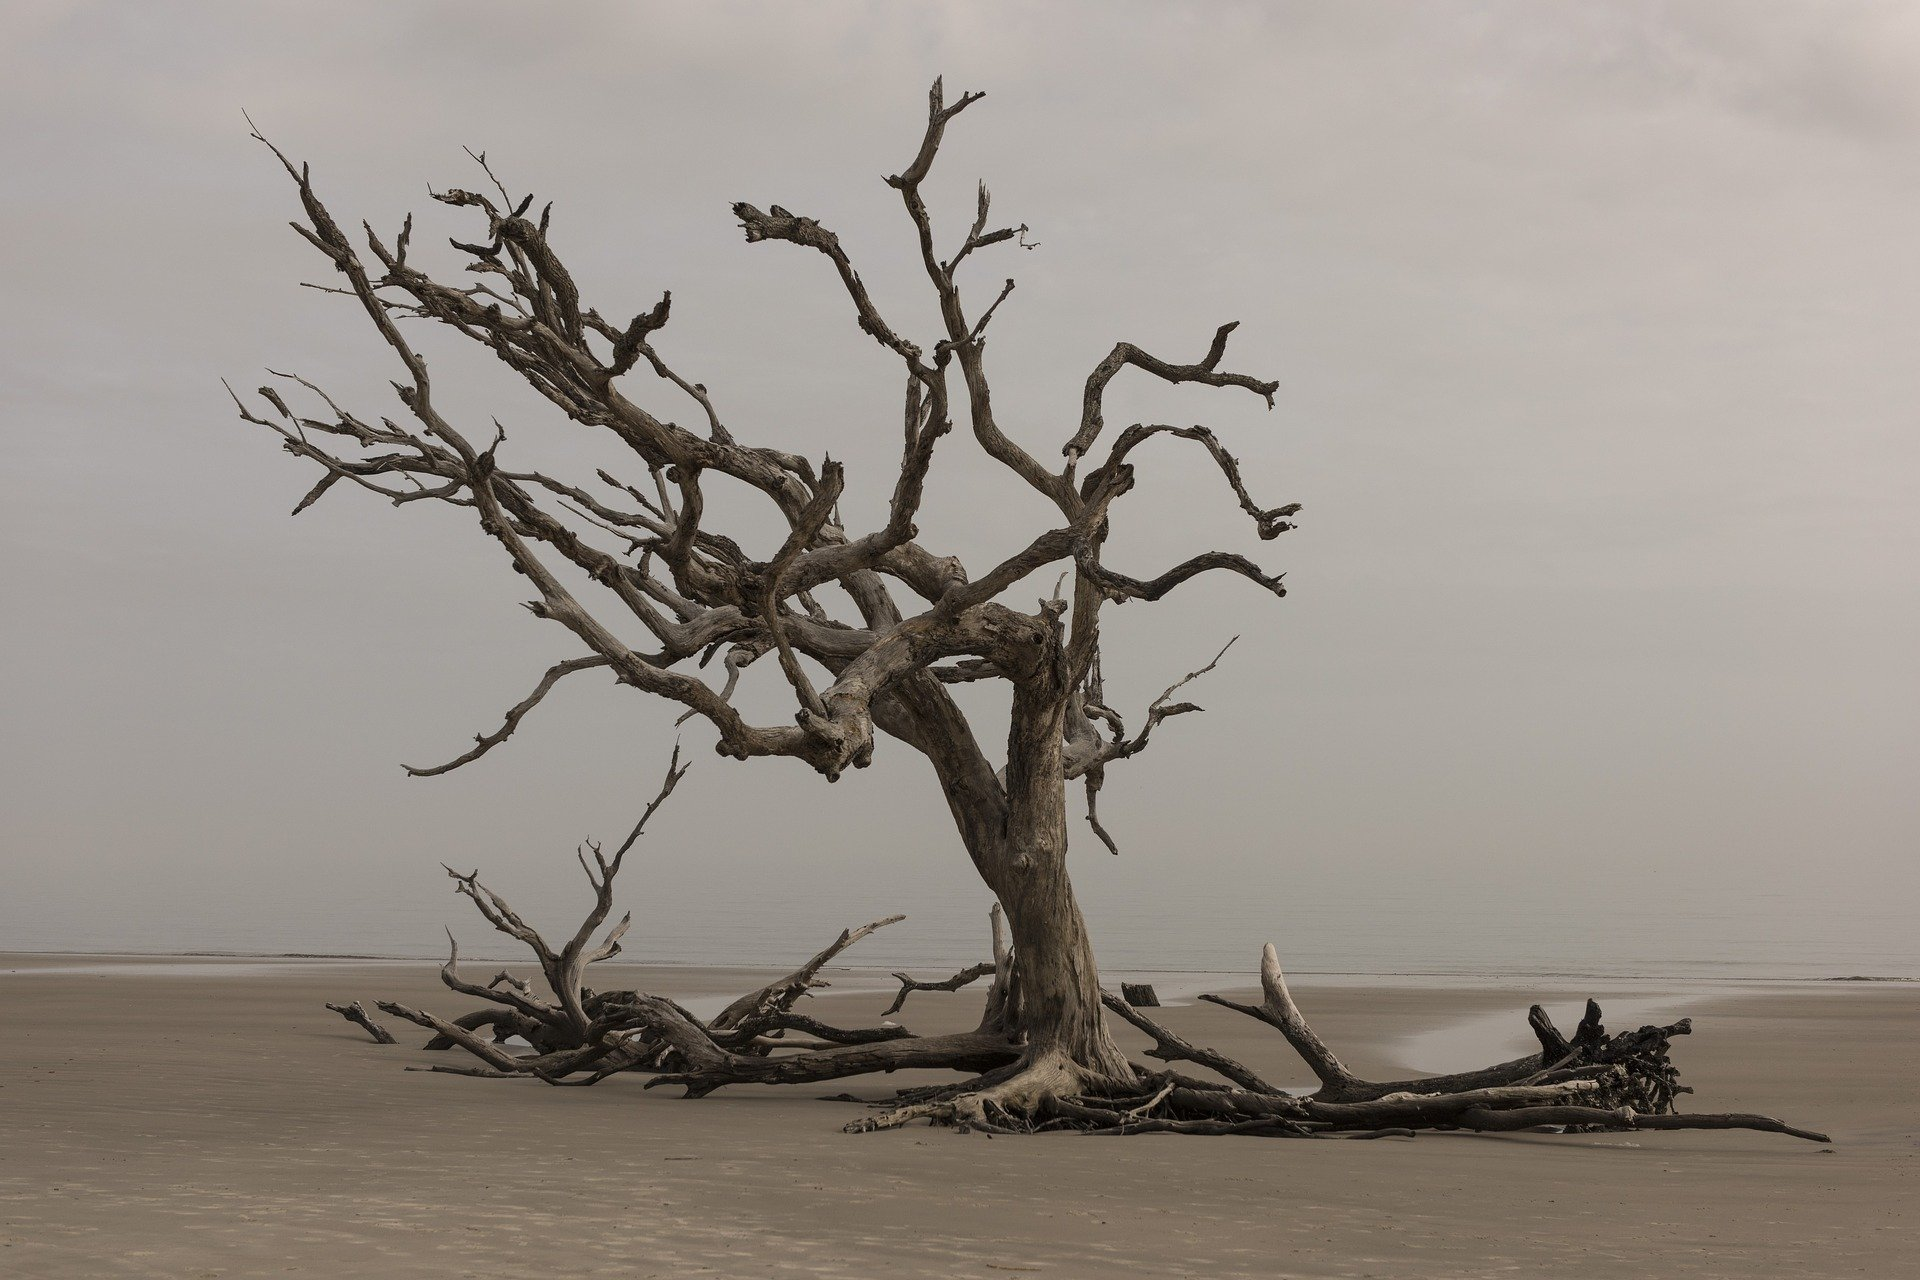 Lone End – Mythri Anand